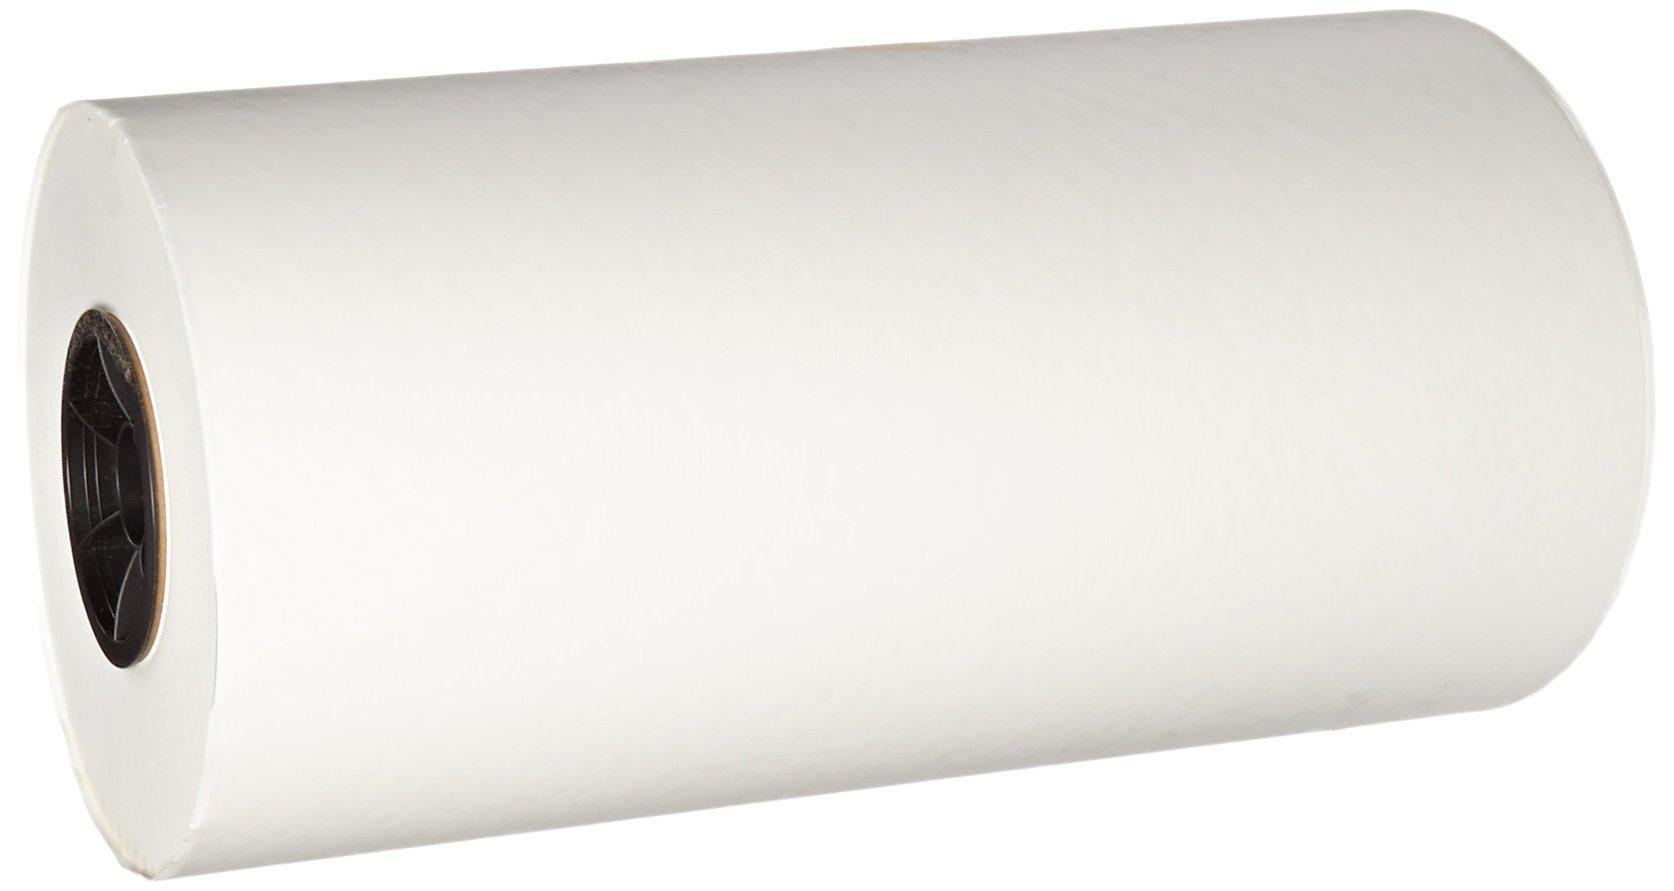 Bagcraft Papercon 145015 FL15 Paper/Poly Regular Weight Freezloc Freezer Paper Roll, 1100' Length x 15'' Width, White by Bagcraft Papercon